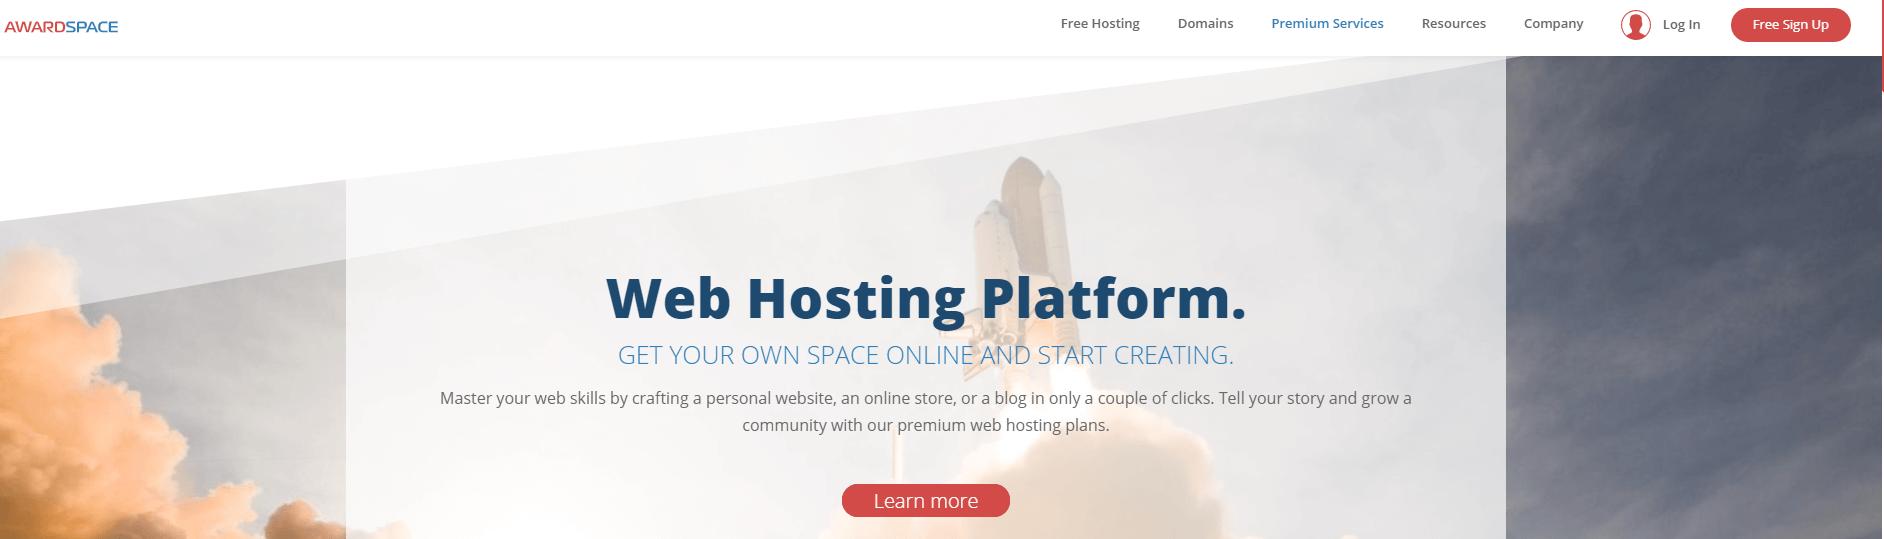 AwardSpace虚拟主机平台。